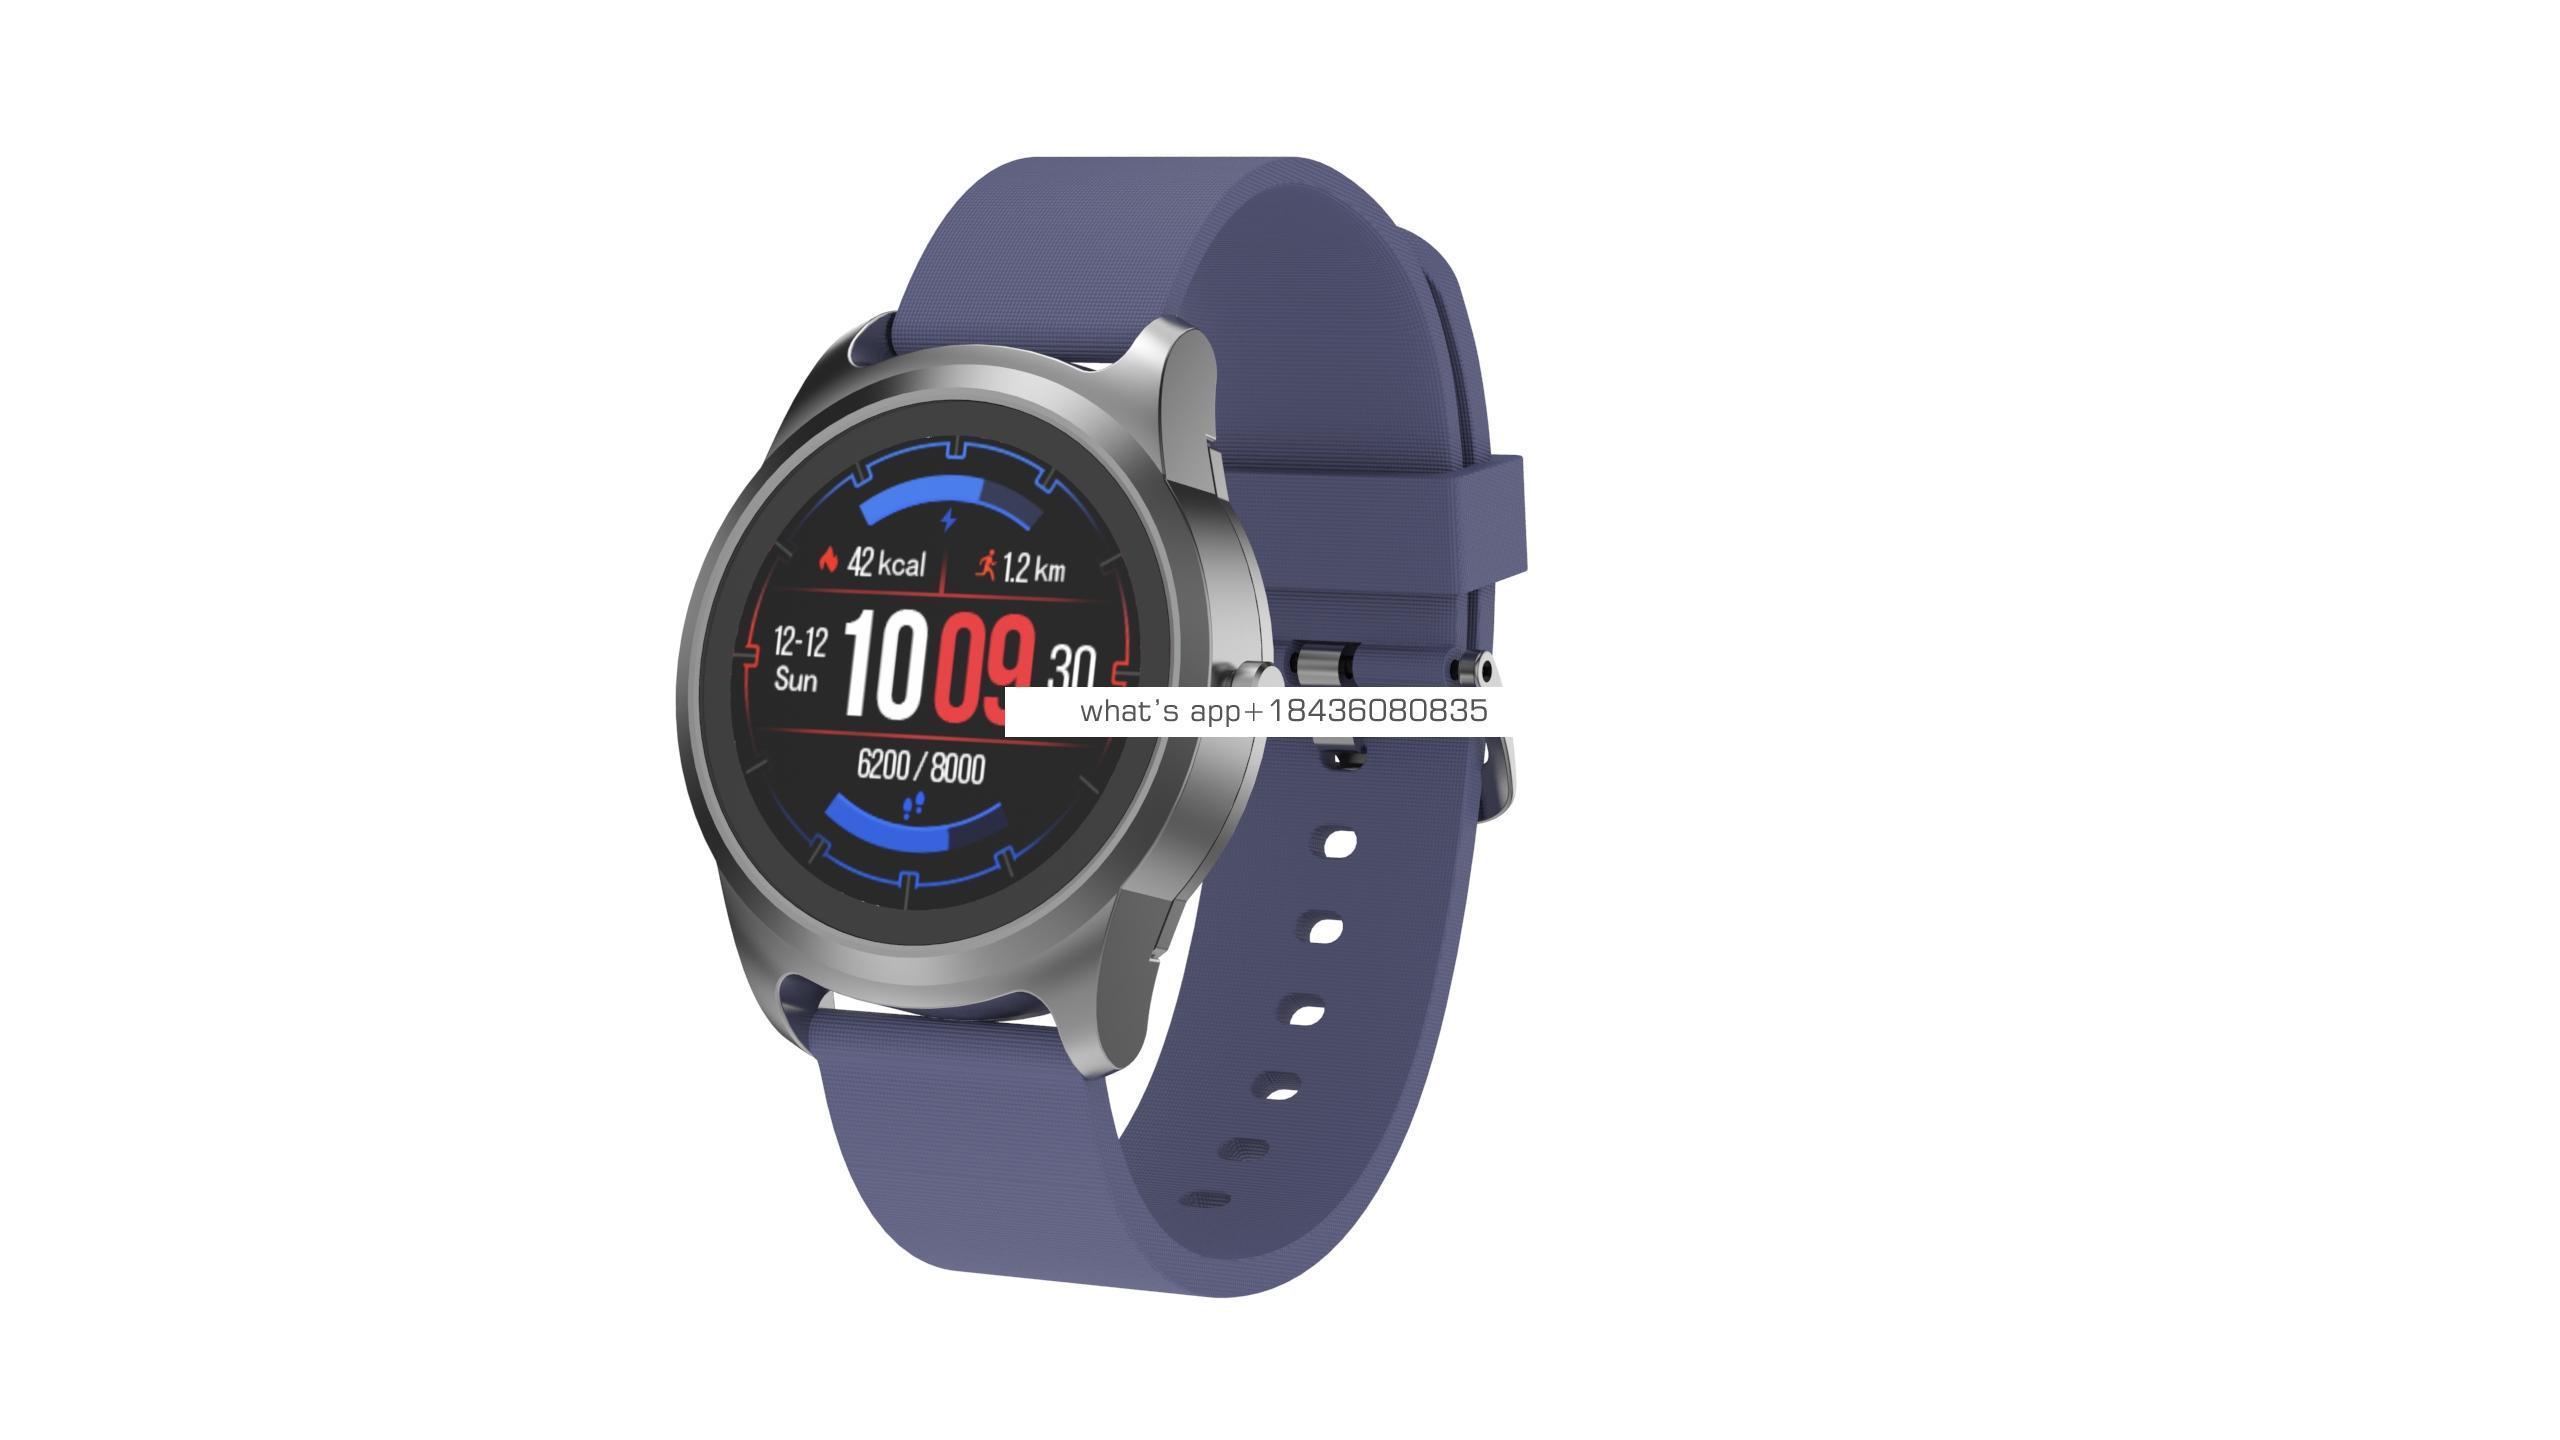 OEM smart watch 2019 new style GPS smartwatch bracelet for outdoor sports